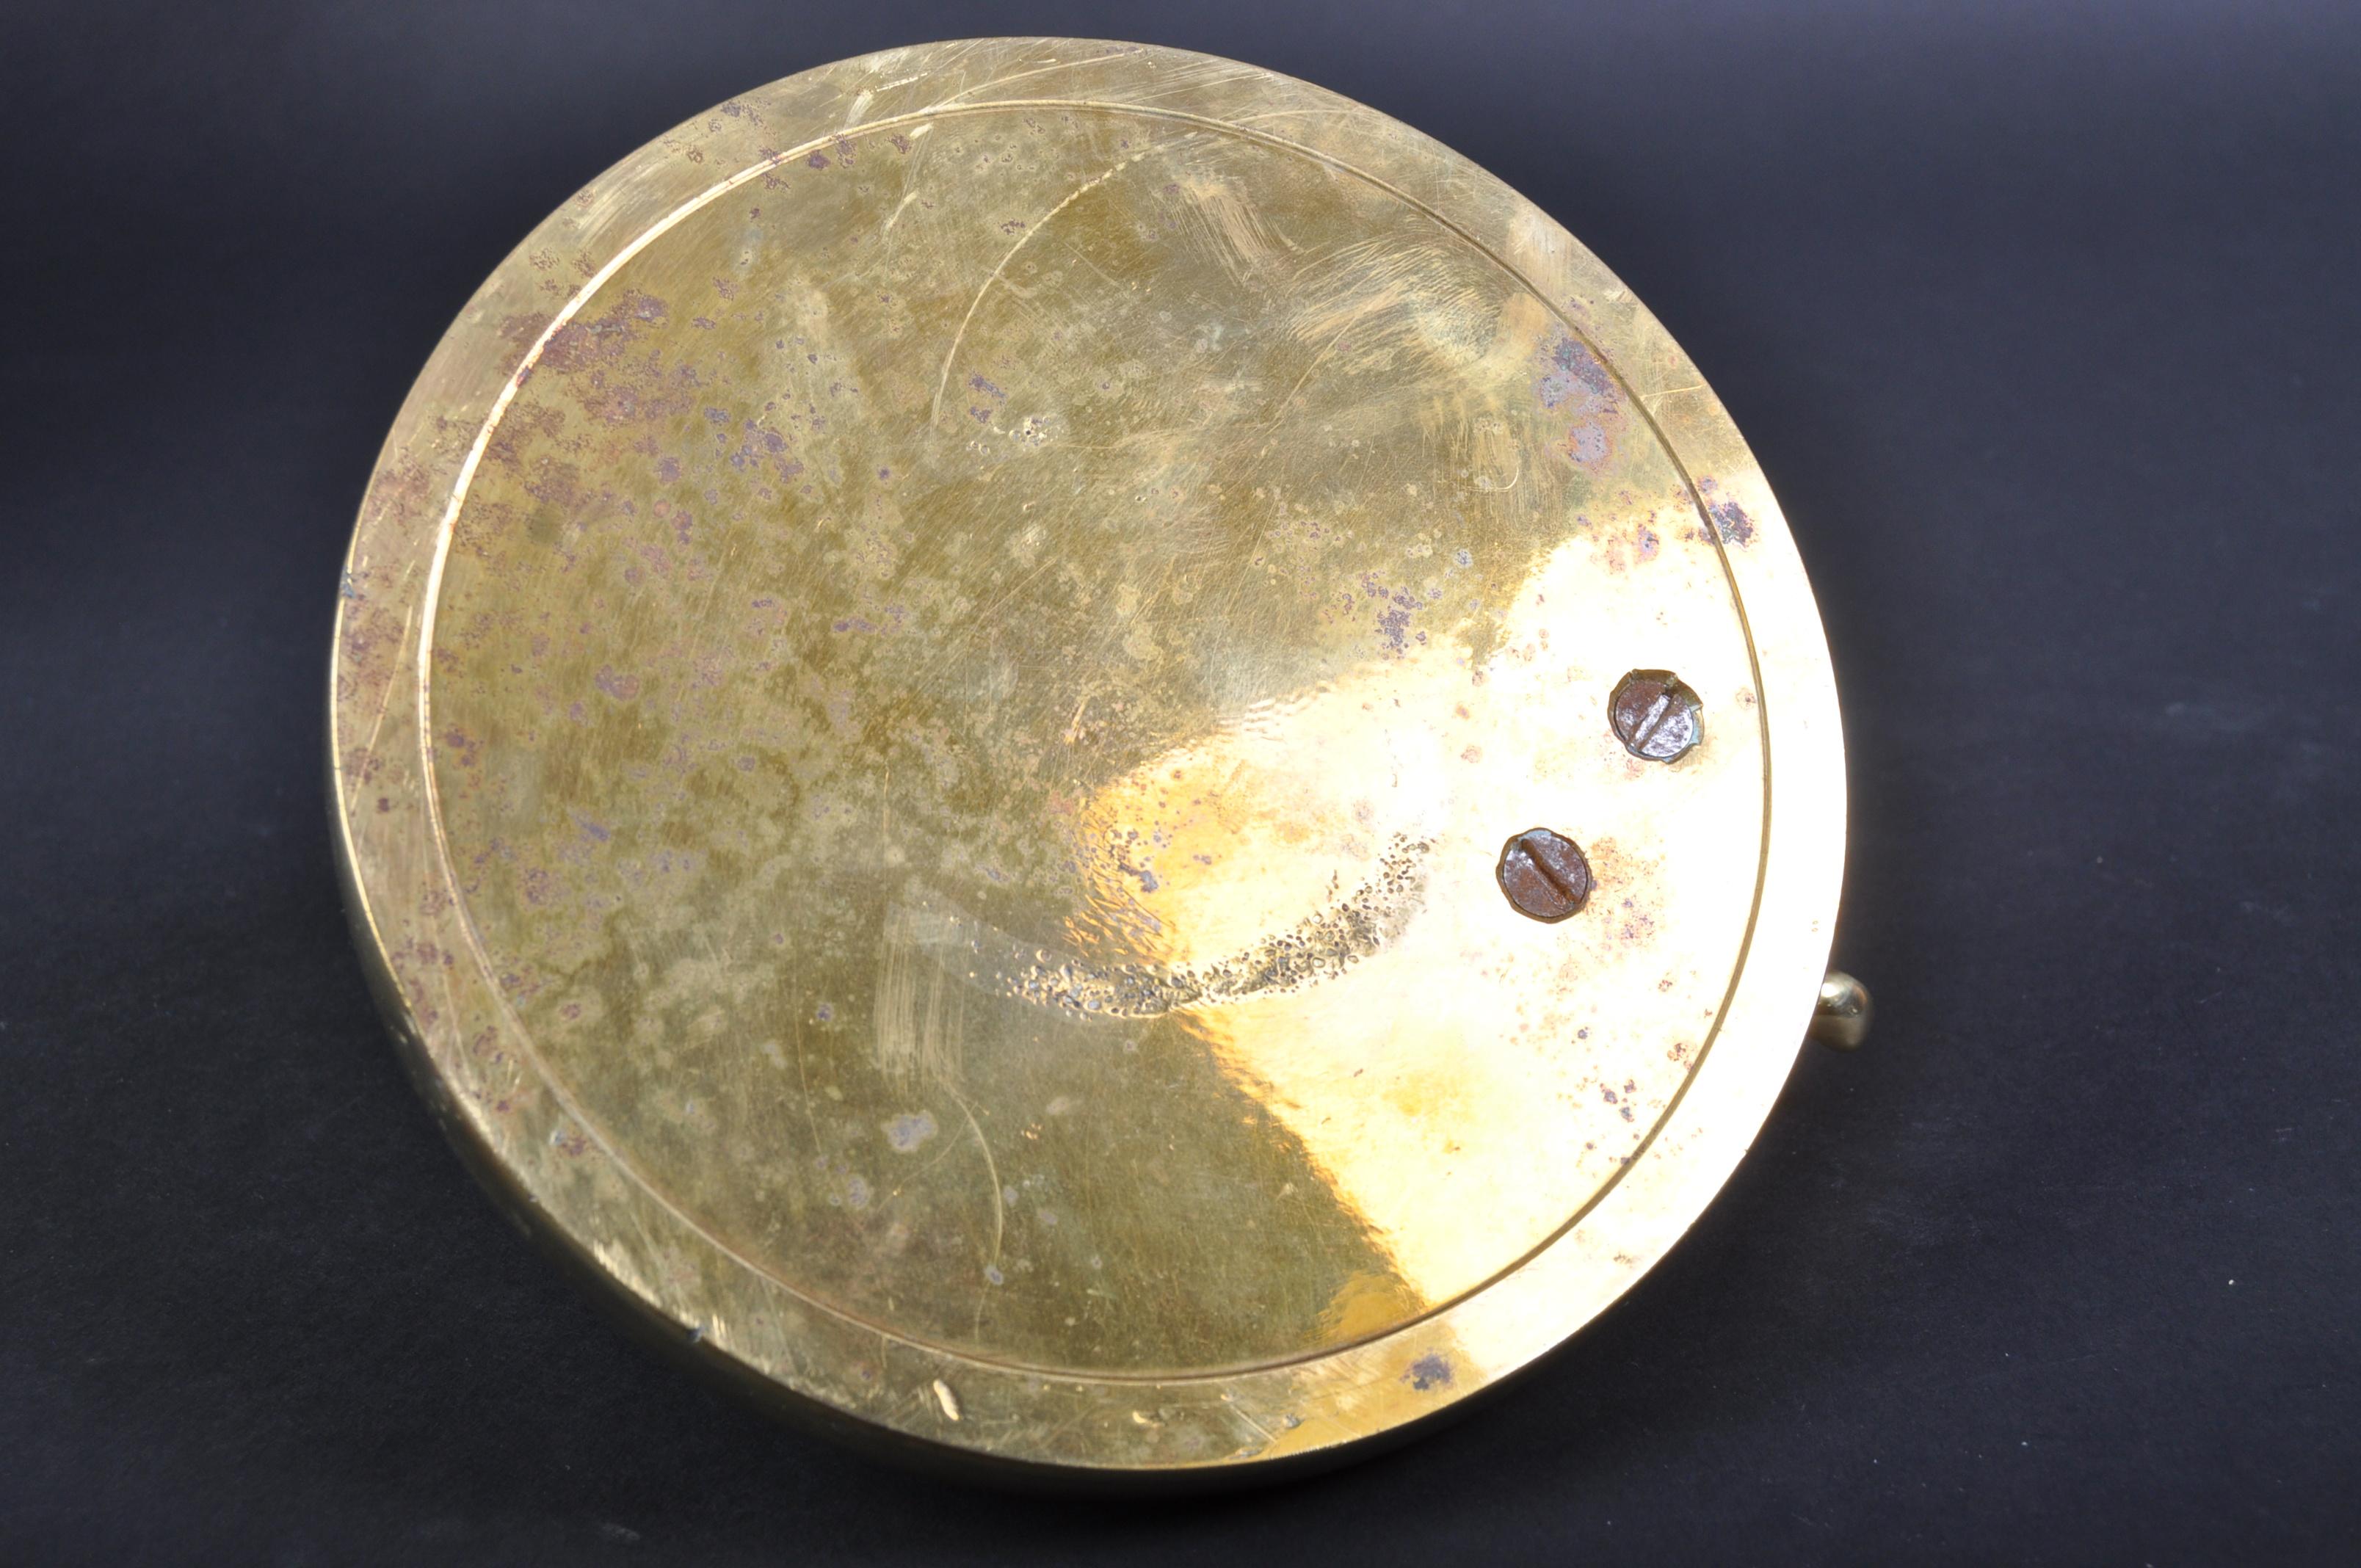 JAGUAR - VINTAGE 20TH CENTURY BRASS PROMOTIONAL ASHTRAY - Image 5 of 5